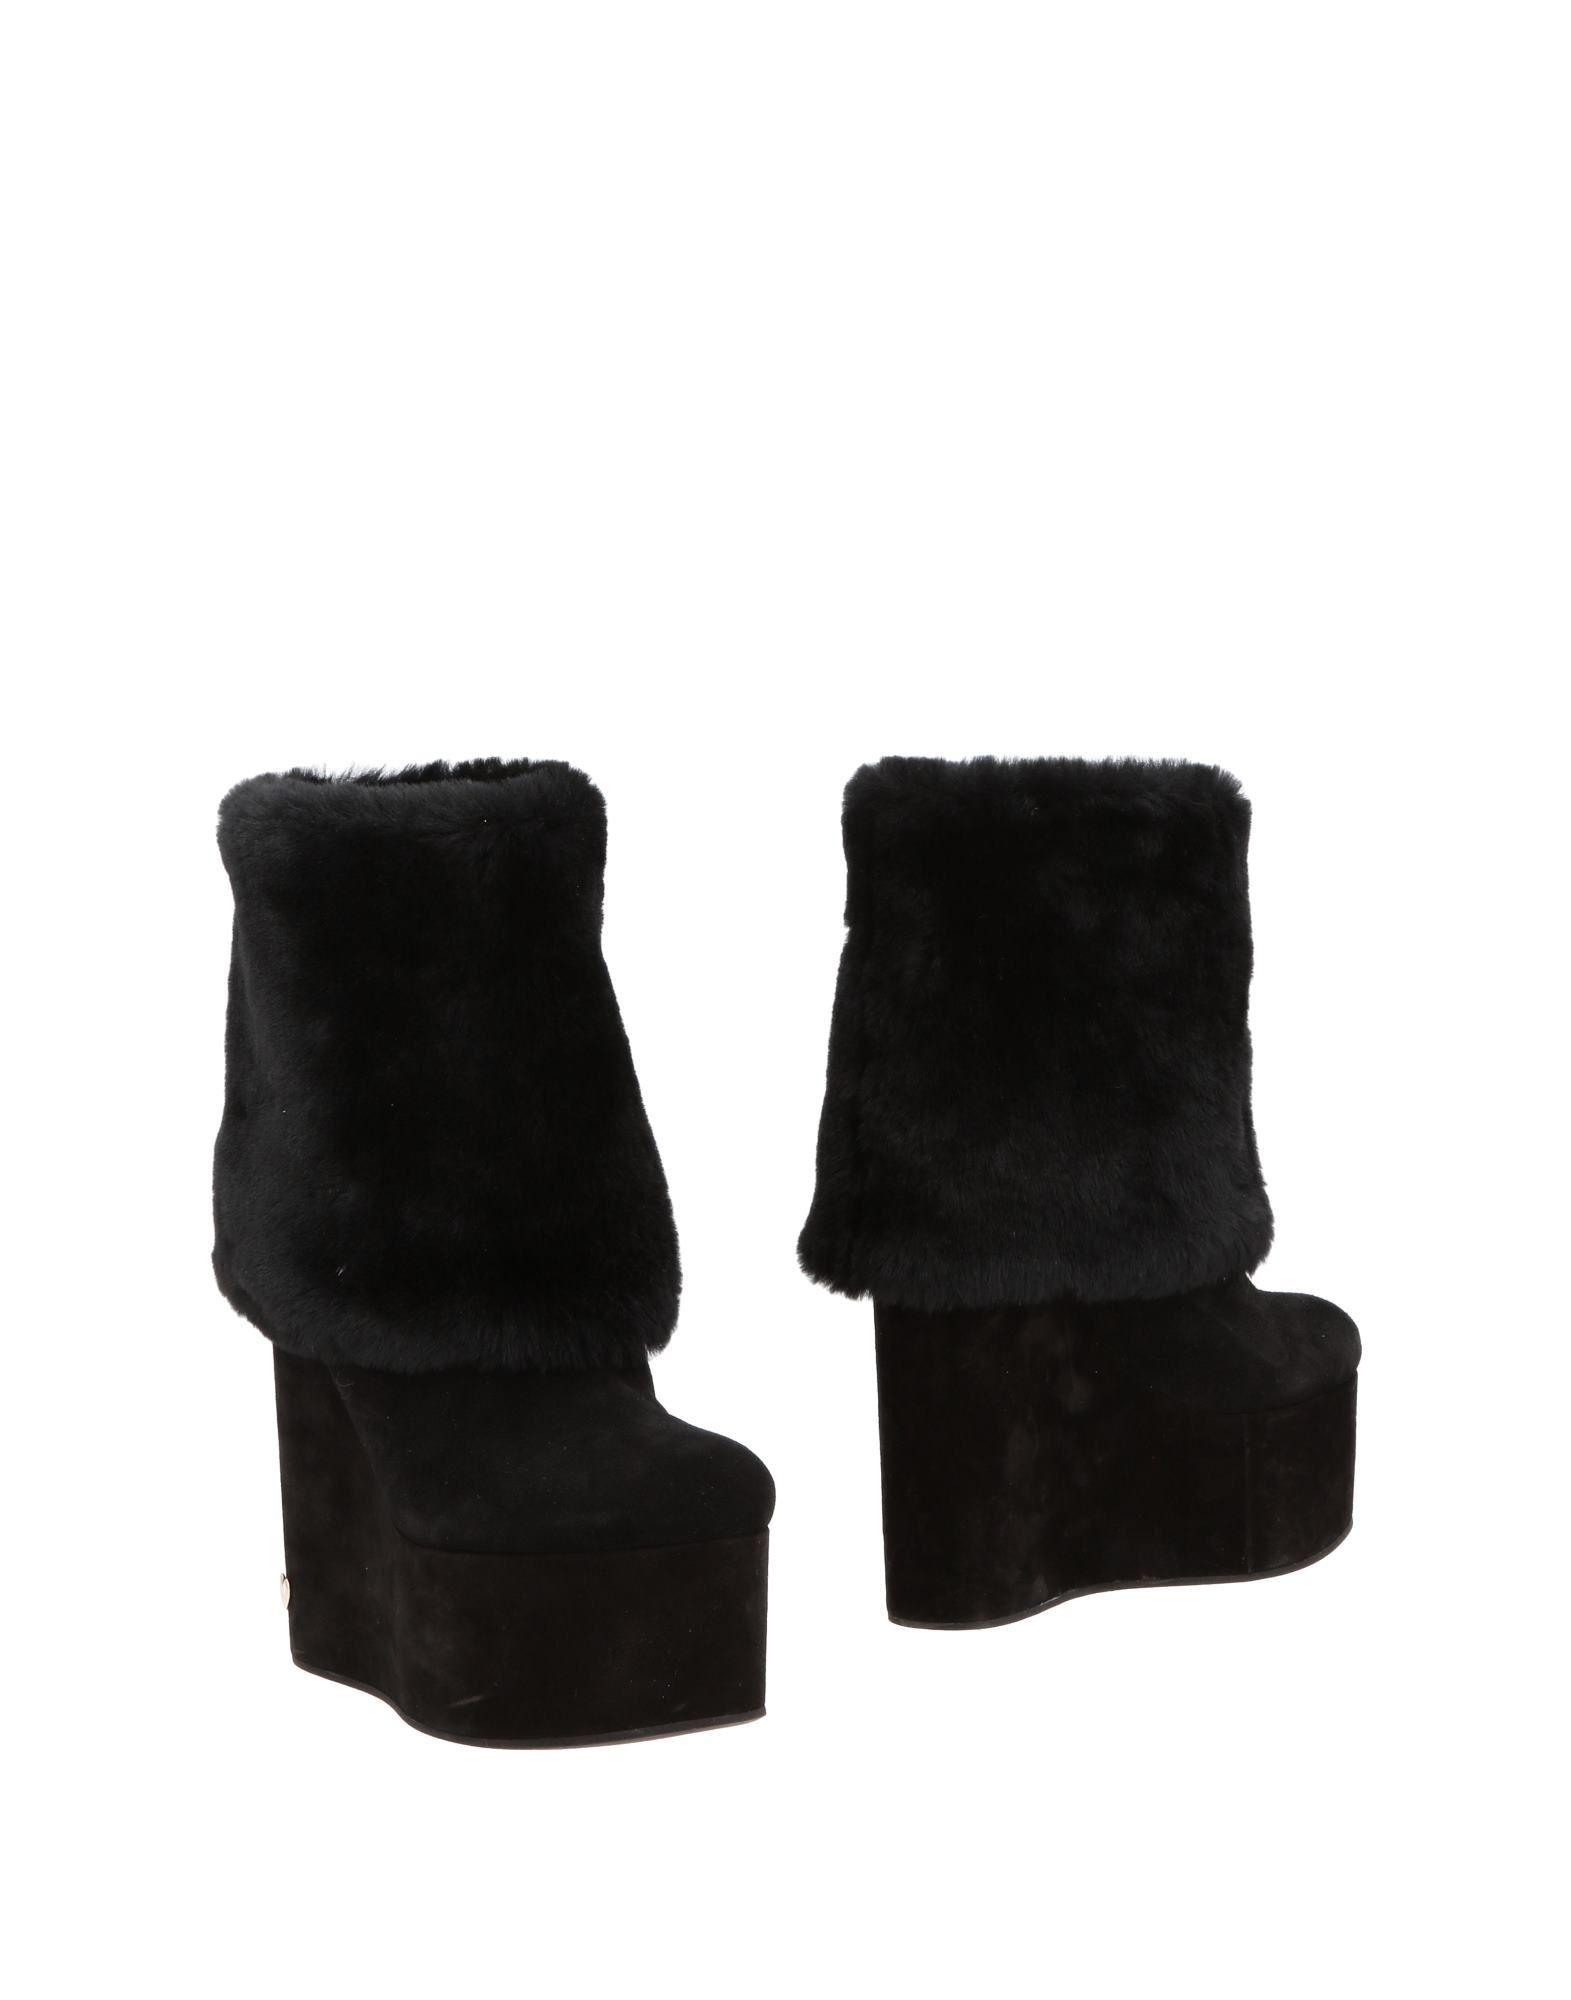 Haltbare Mode Beliebte billige Schuhe Twin 11484909GJ Beliebte Mode Schuhe 456e1b